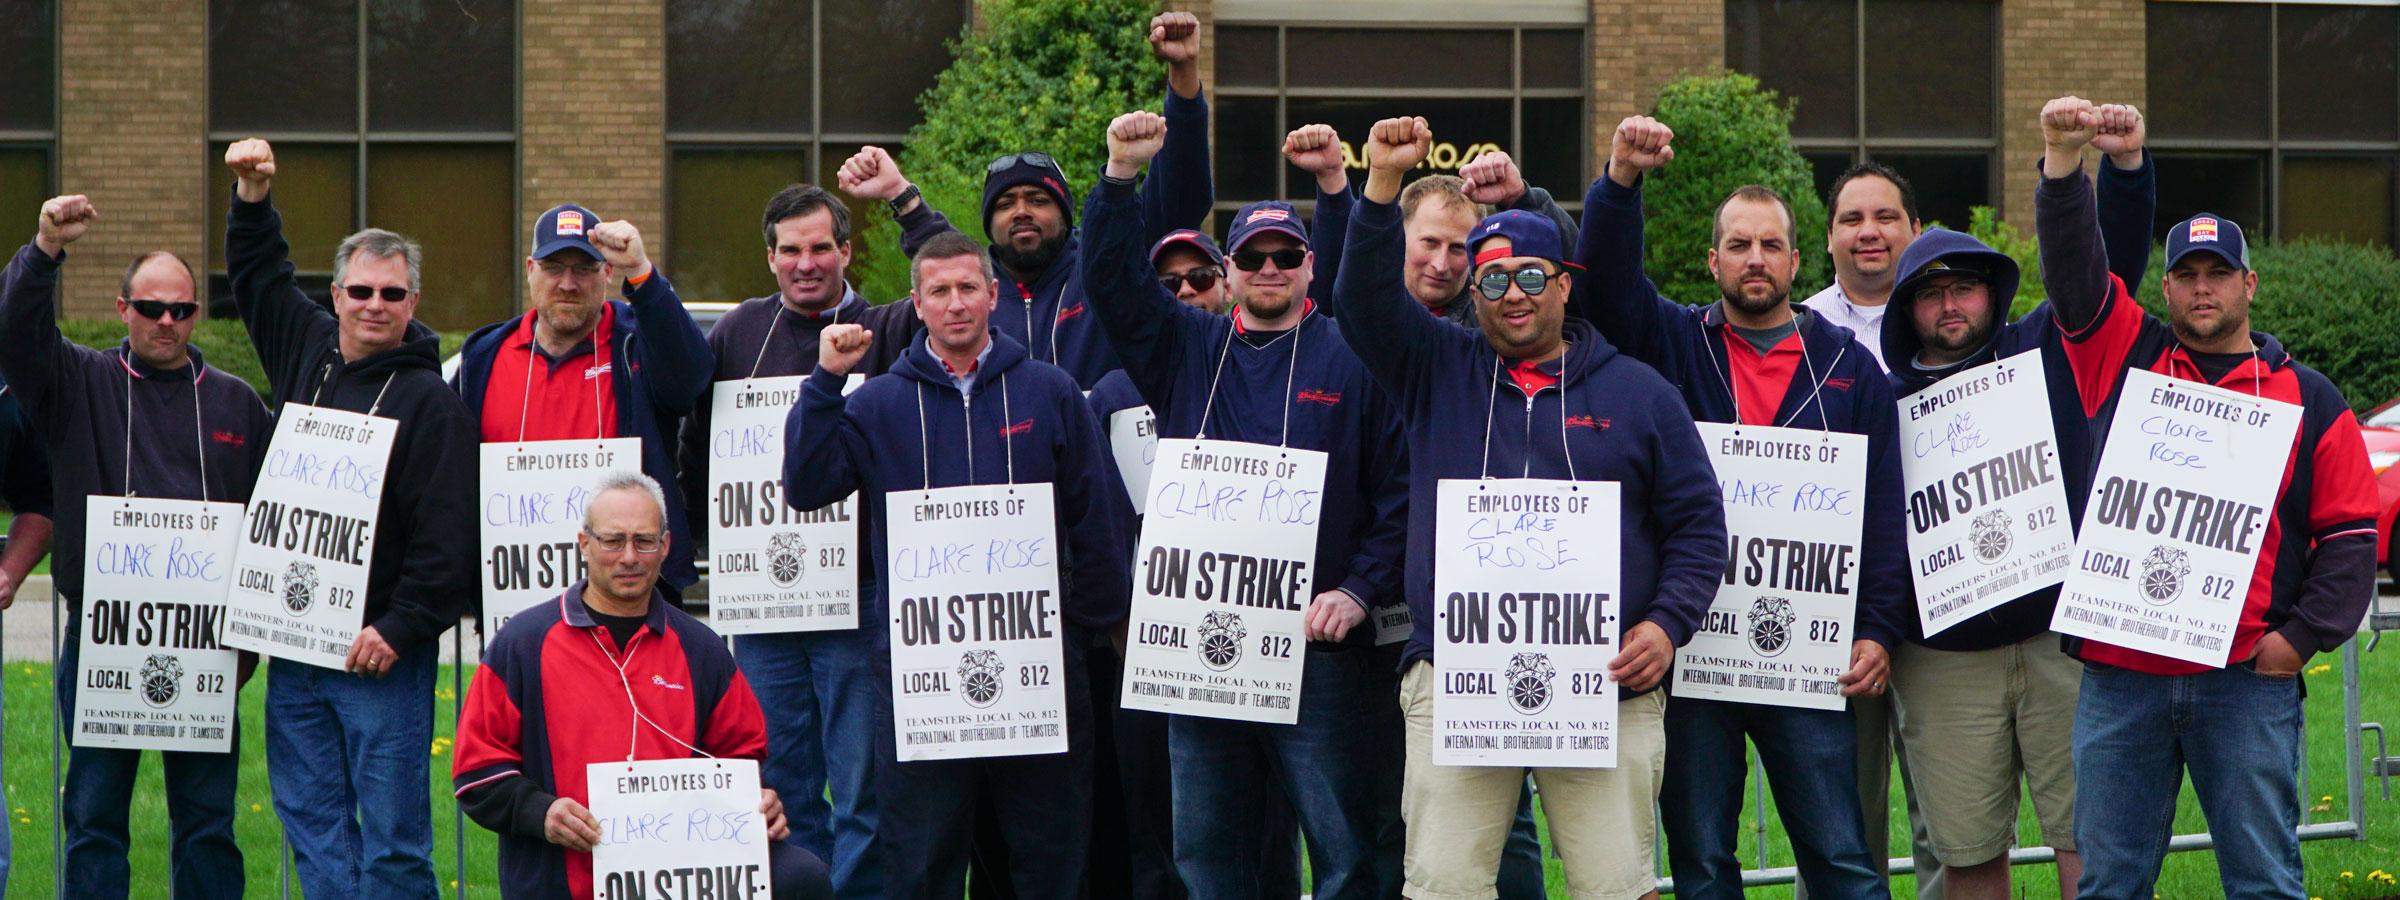 Teamsters Win Clare Rose Strike